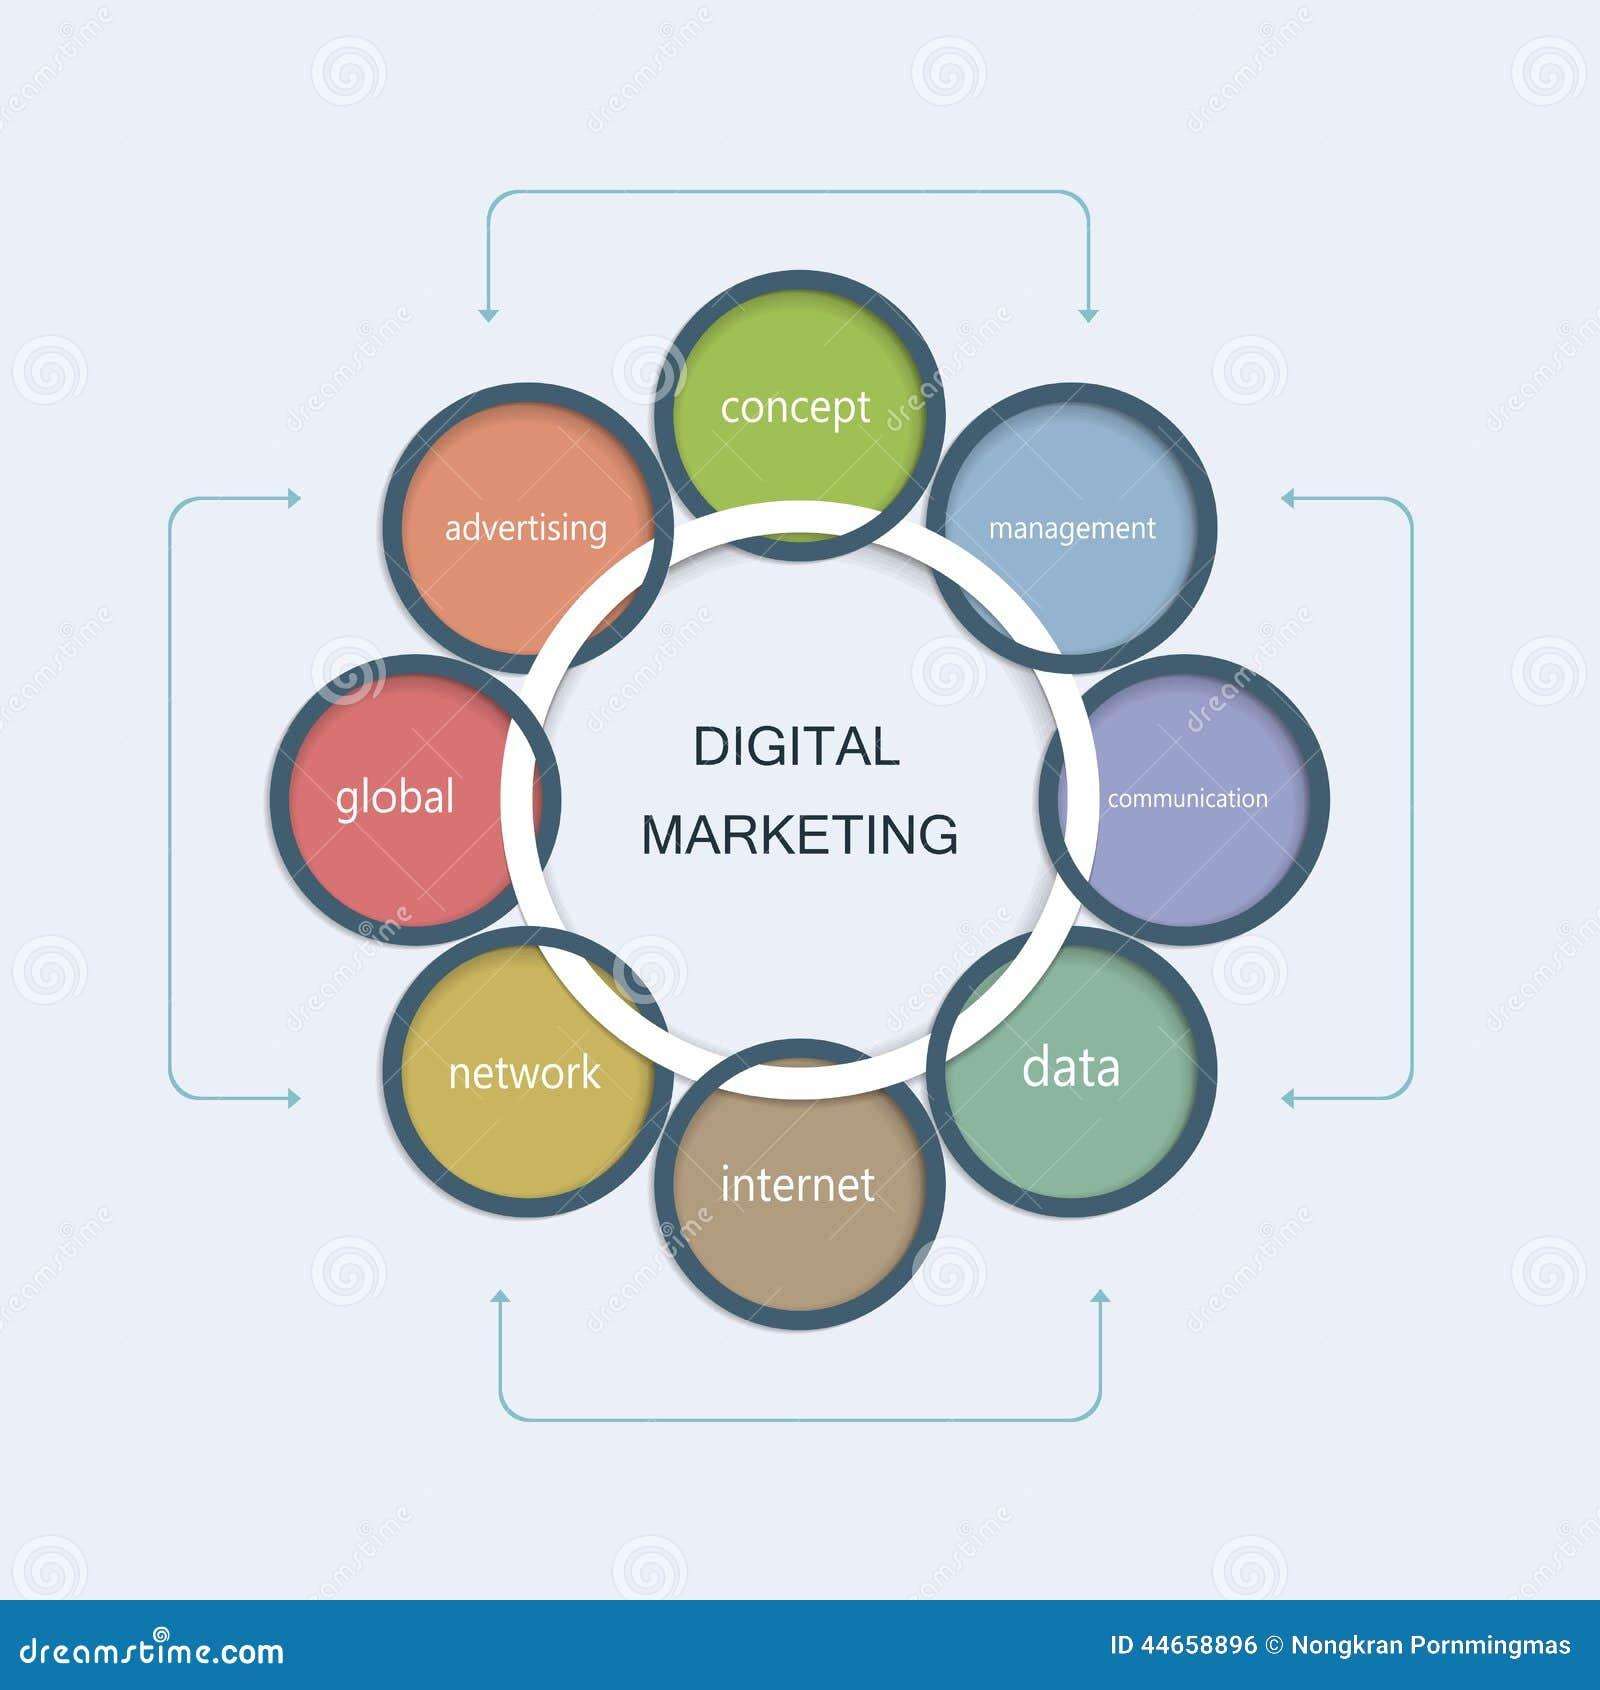 Business Digital Marketing Concept Stock Vector